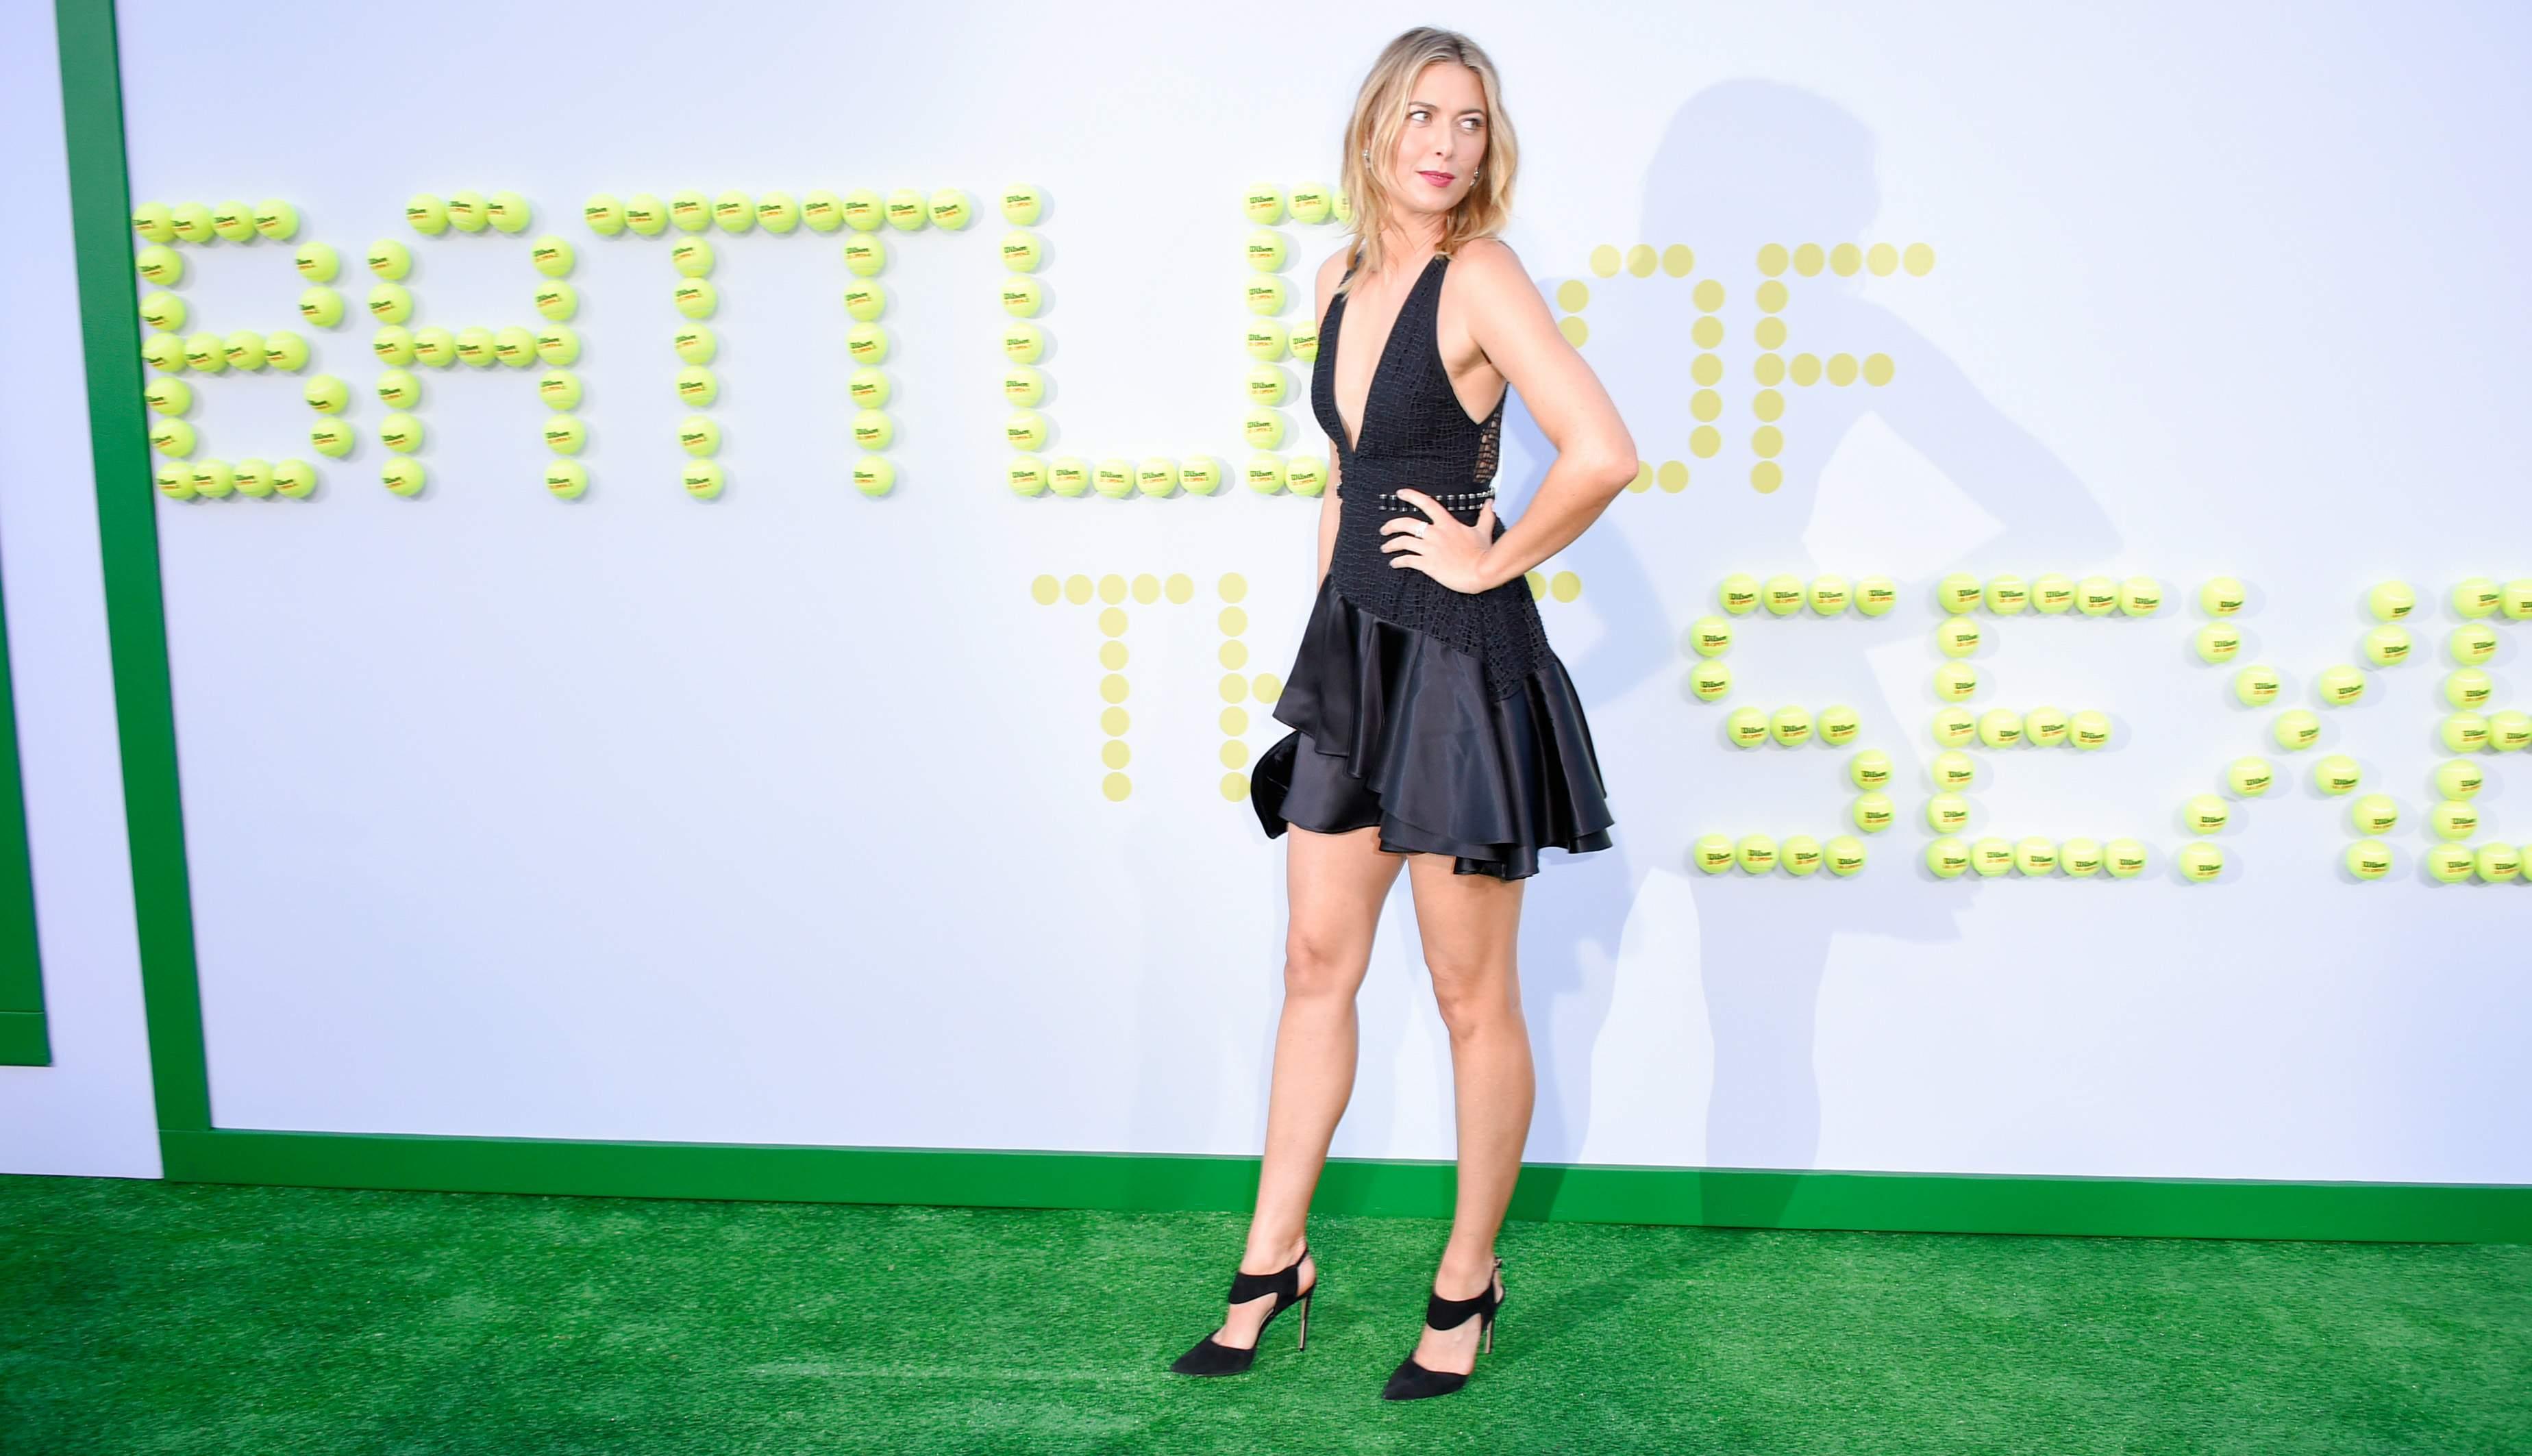 Maria Sharapova Legs For Days